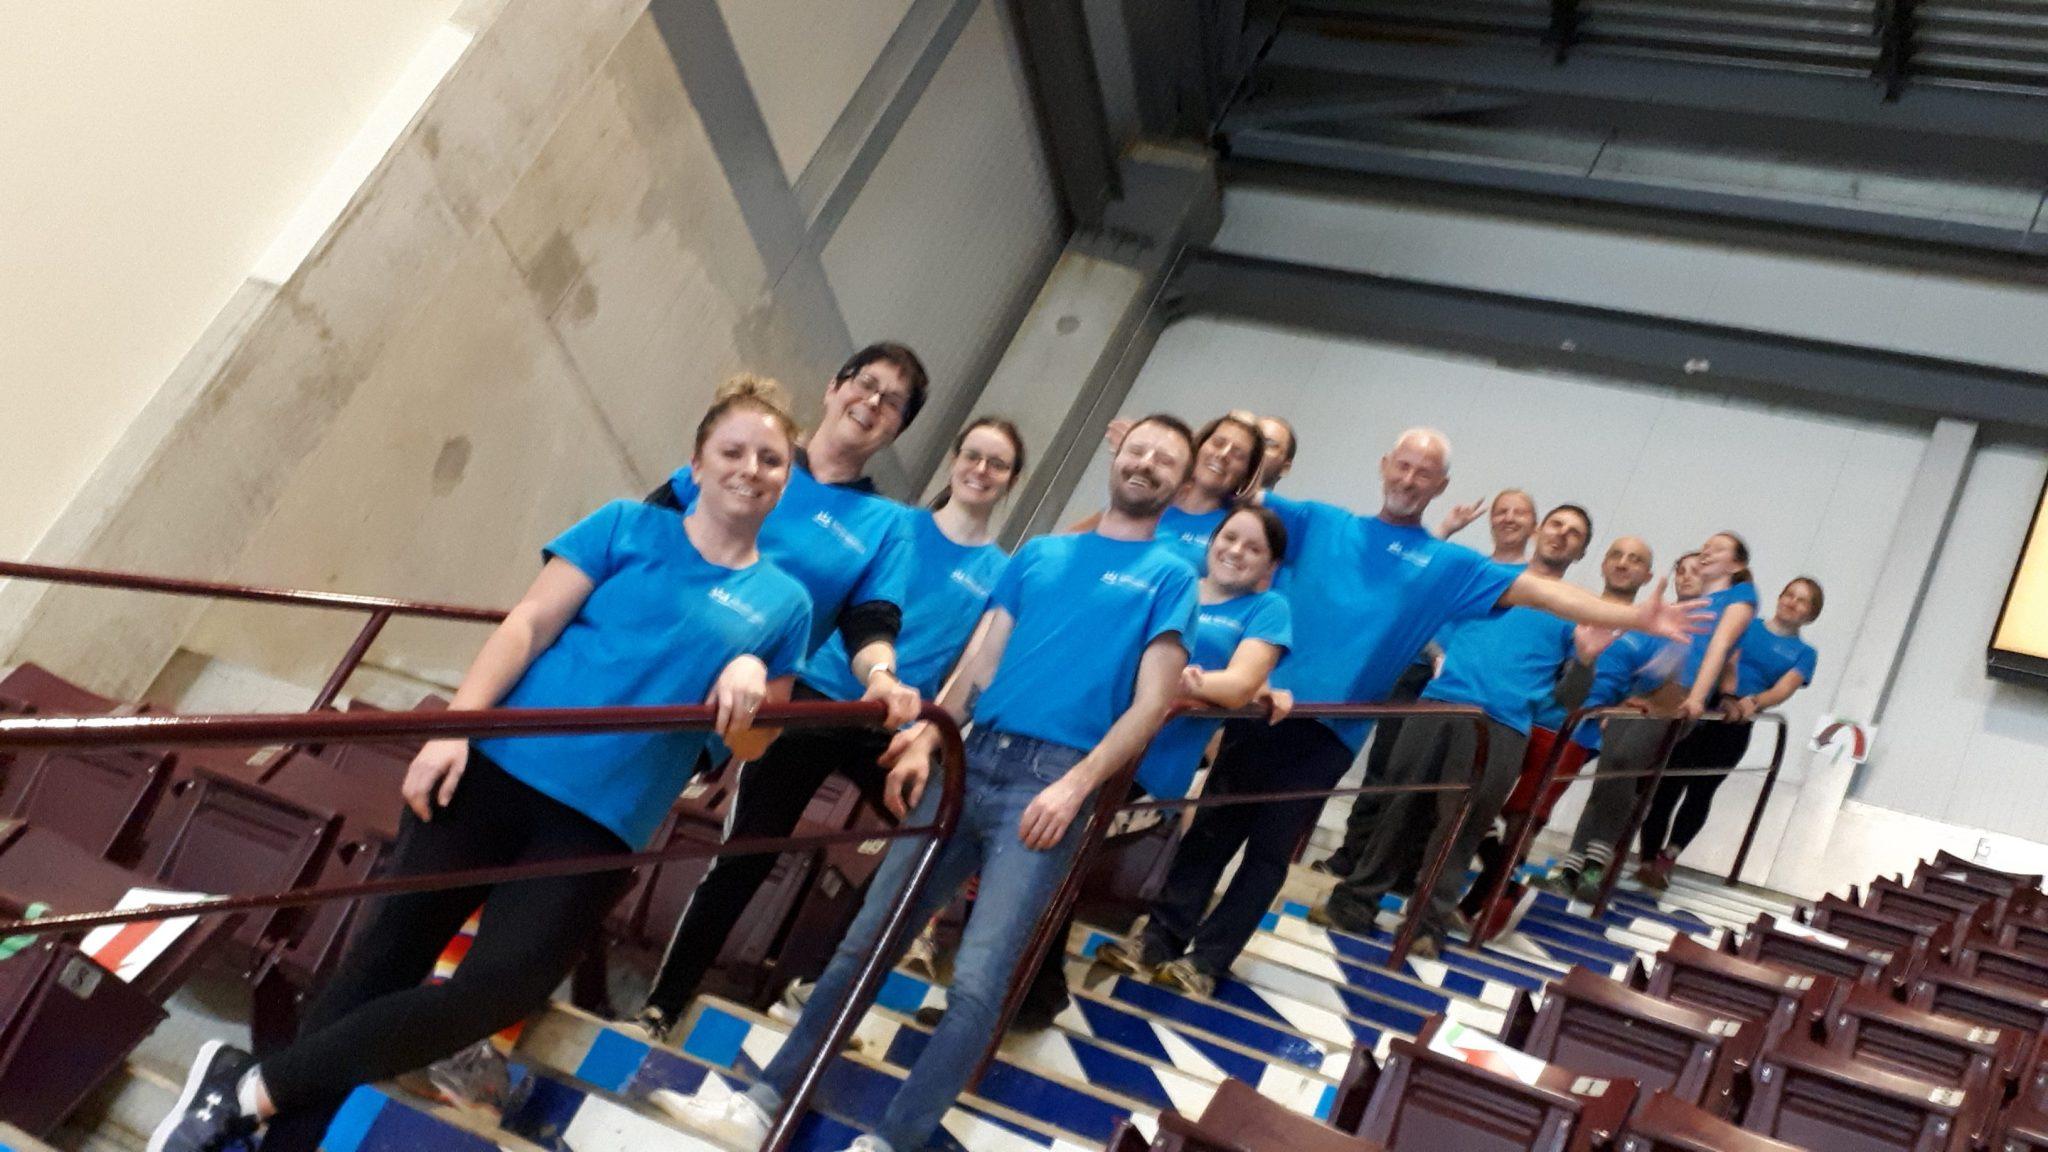 FSWE iclimb2019 team